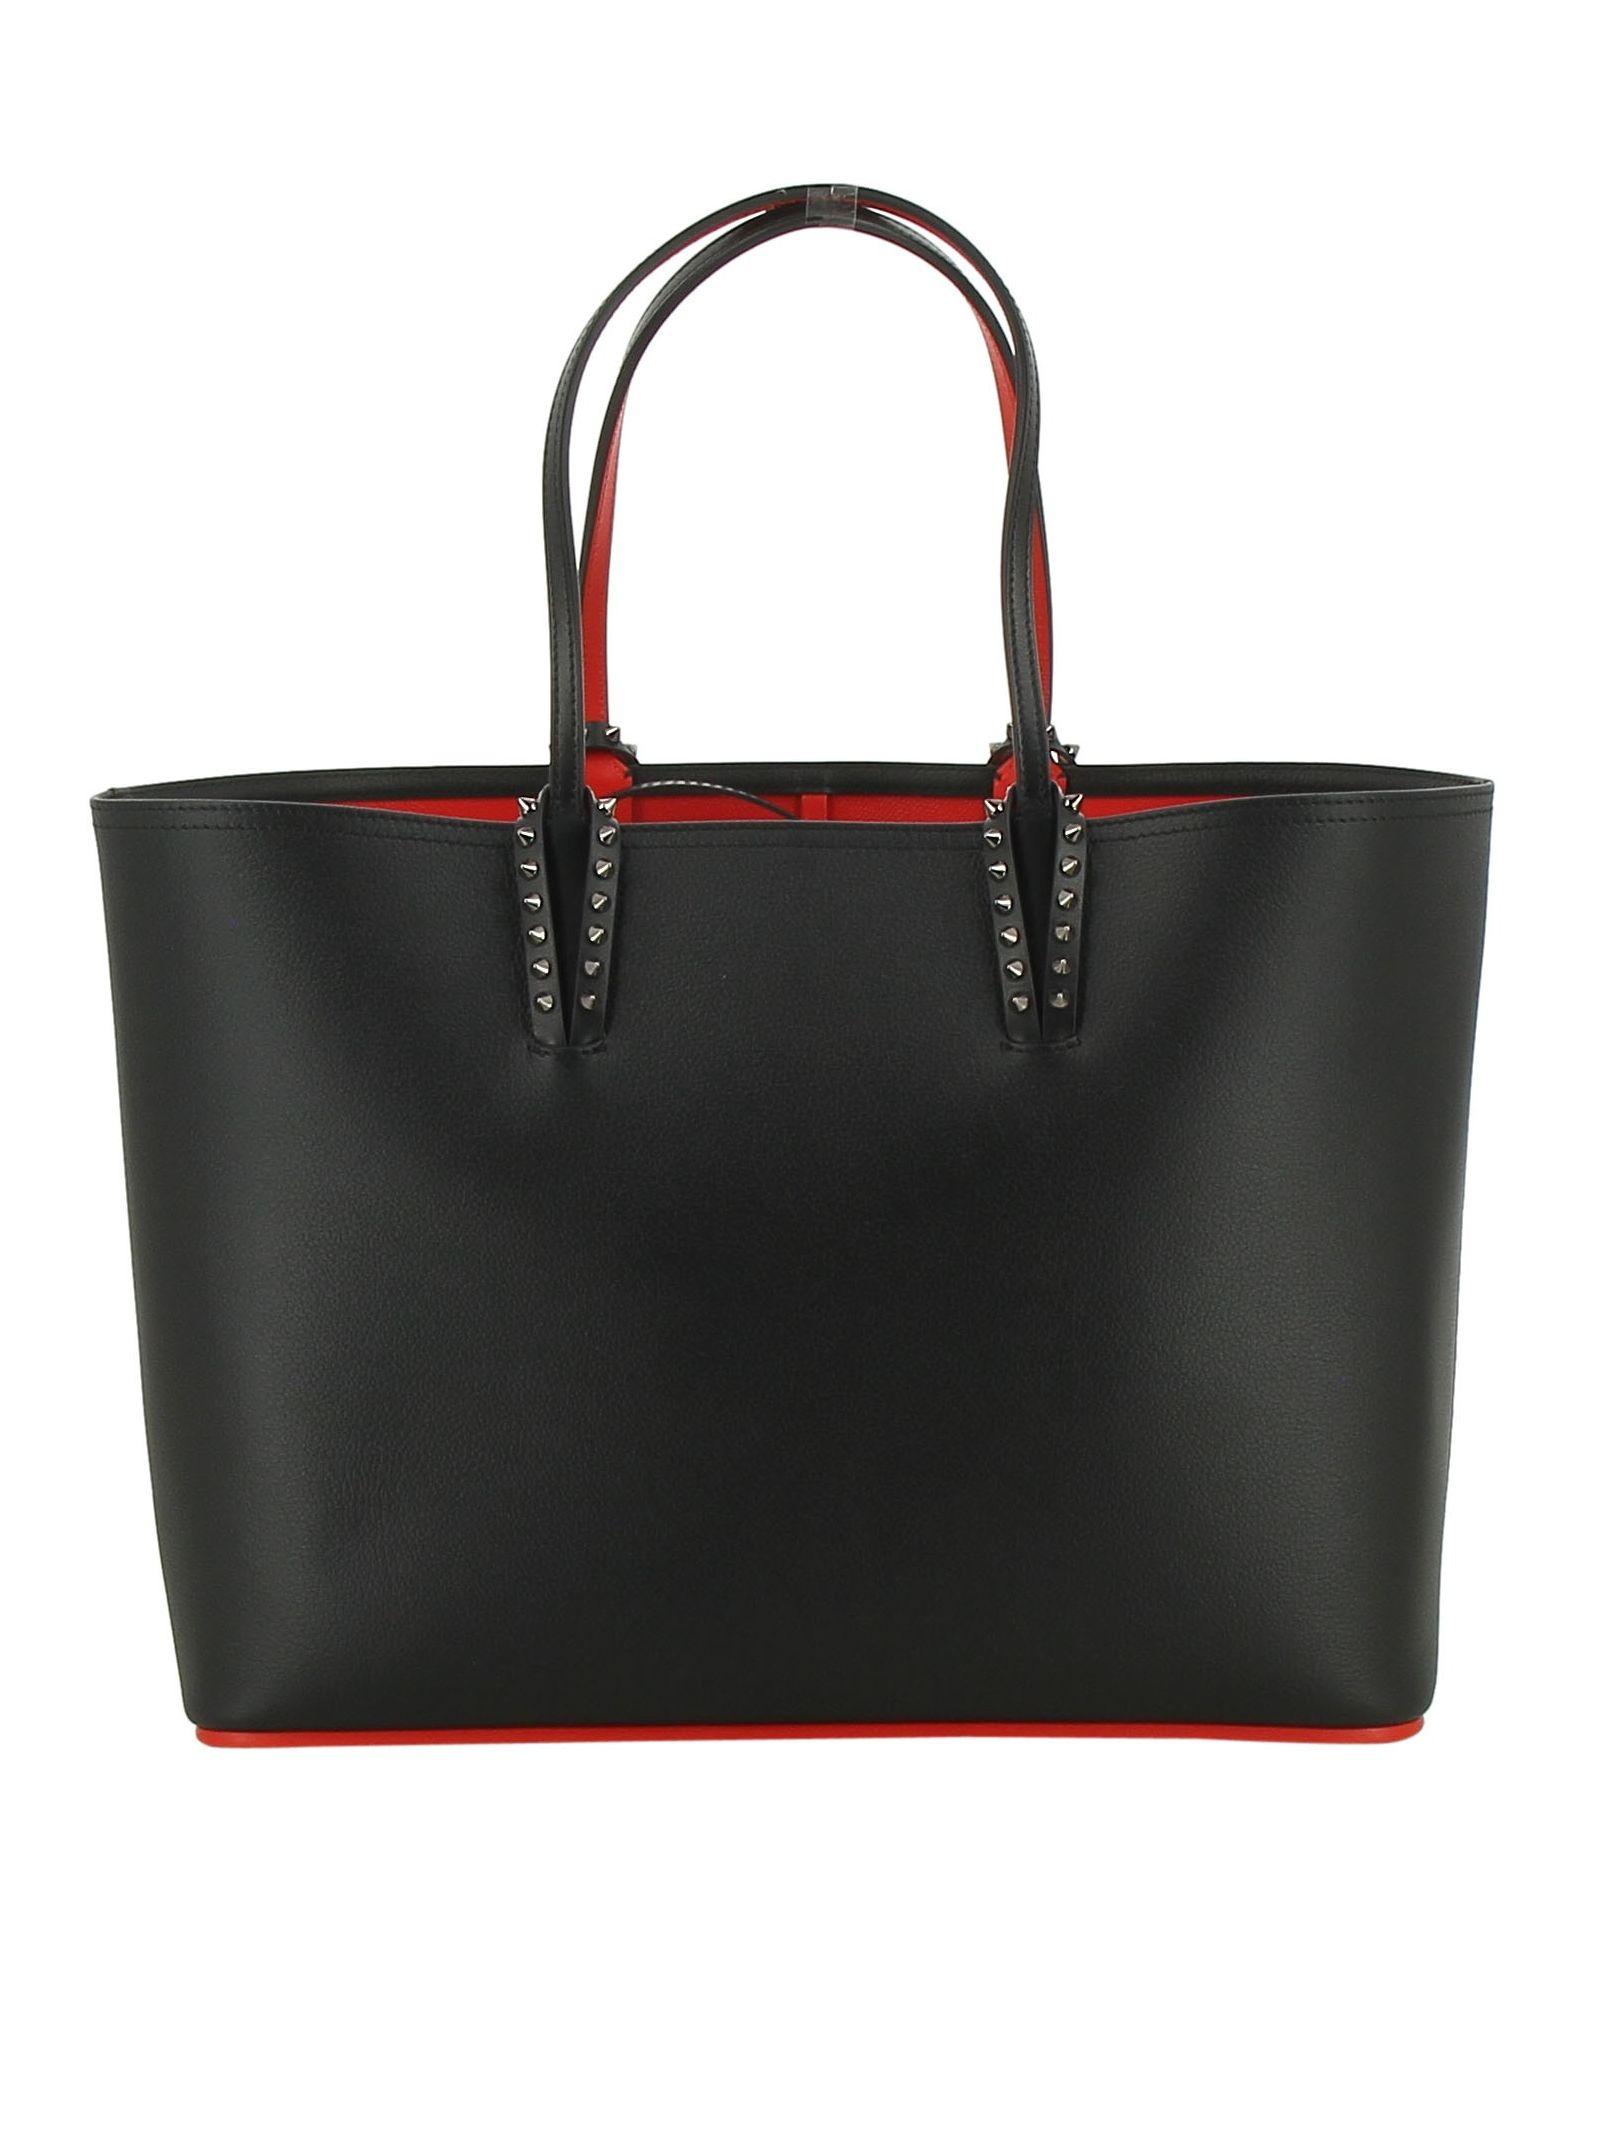 Christian Louboutin Black Leather Tote